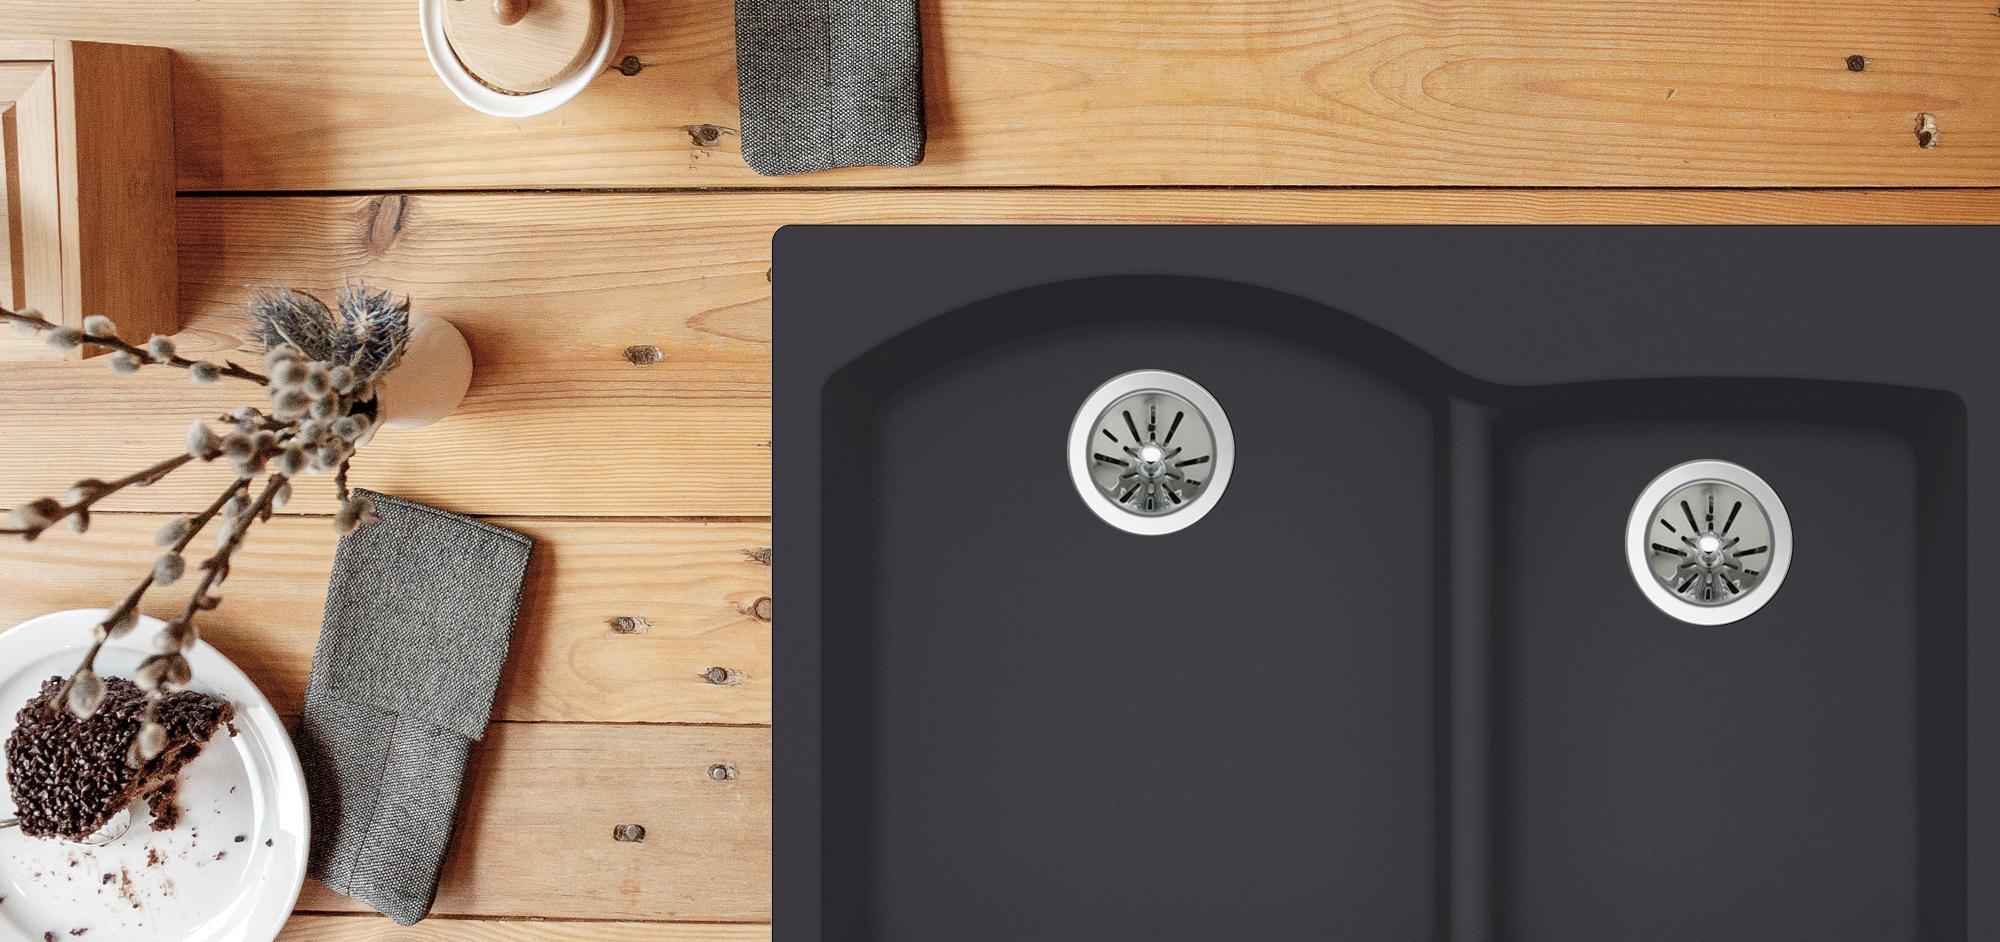 elkay quartz luxe kitchen sinks bold granite colors sleek style. Interior Design Ideas. Home Design Ideas